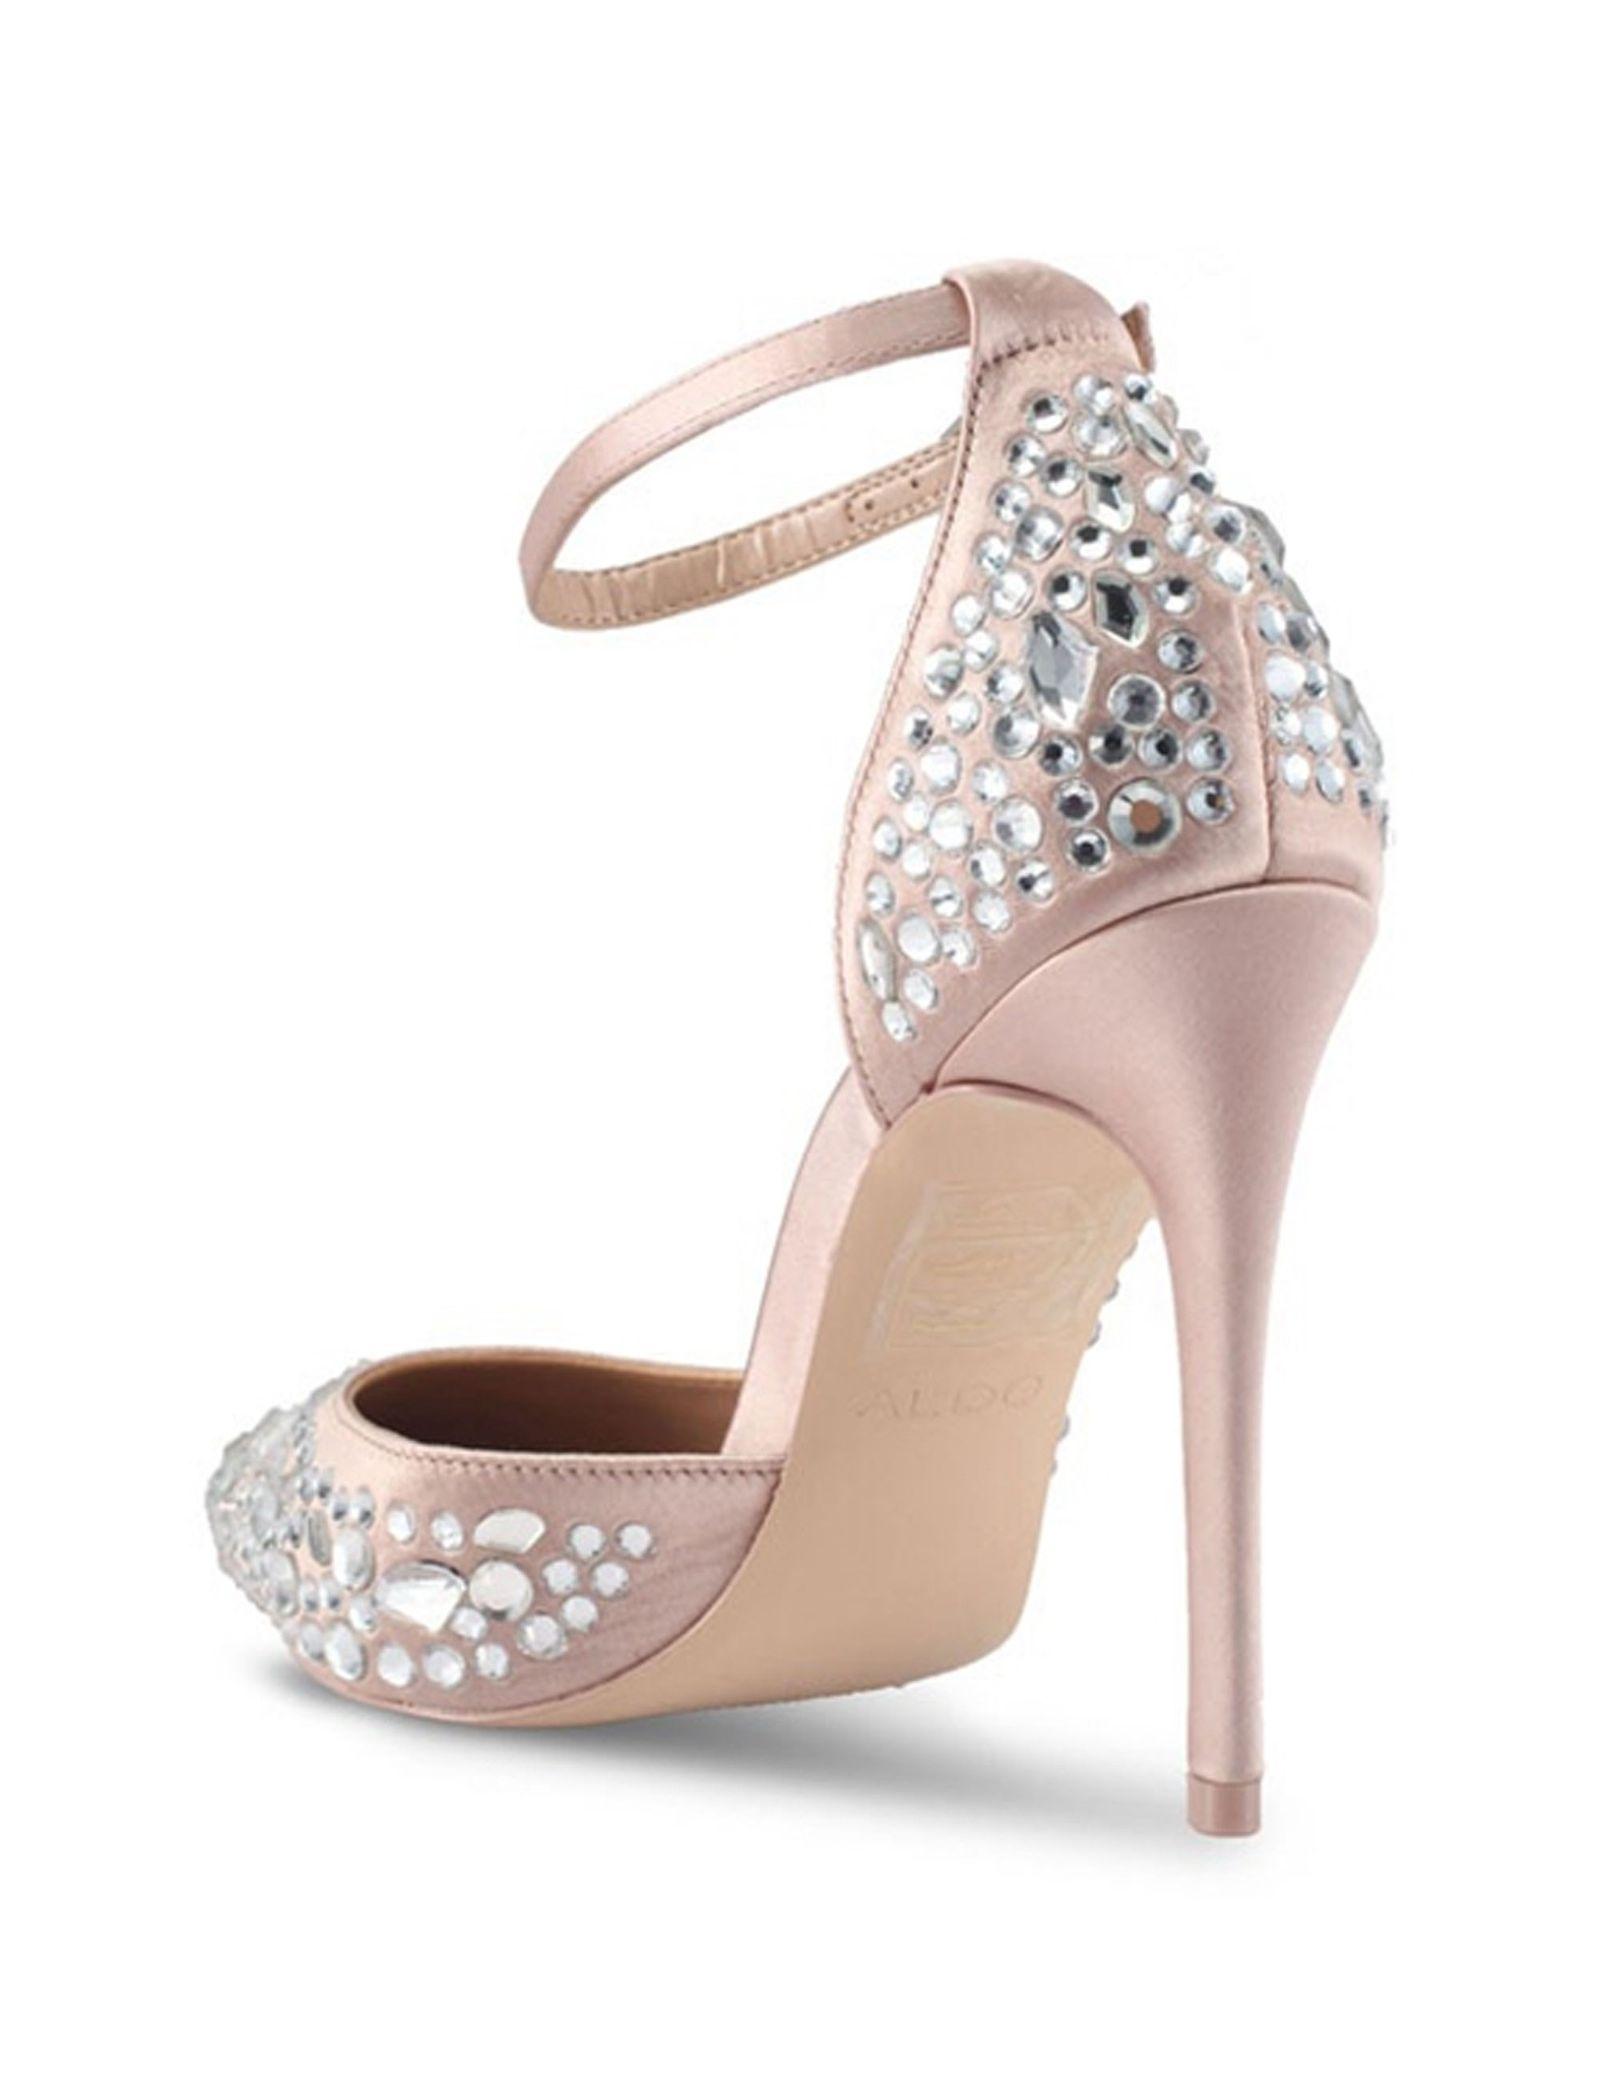 کفش پاشنه بلند پارچه ای زنانه - آلدو - صورتي روشن - 3